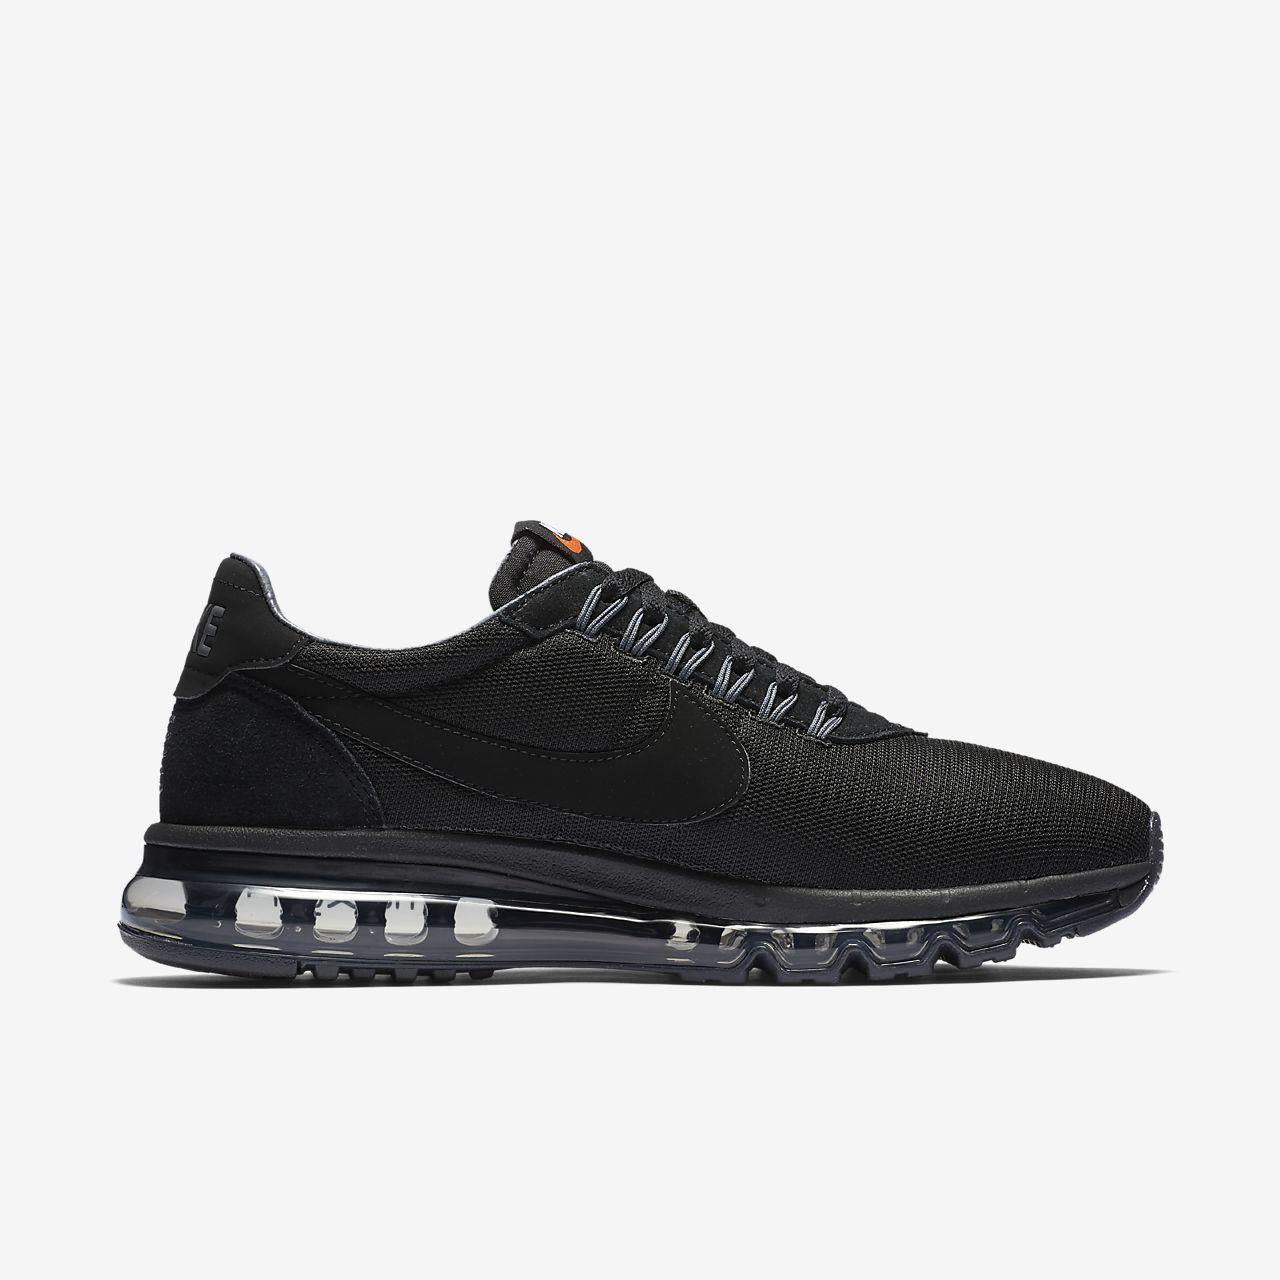 buy popular 94045 9da07 ... Nike Air Max LD-Zero Unisex Shoe